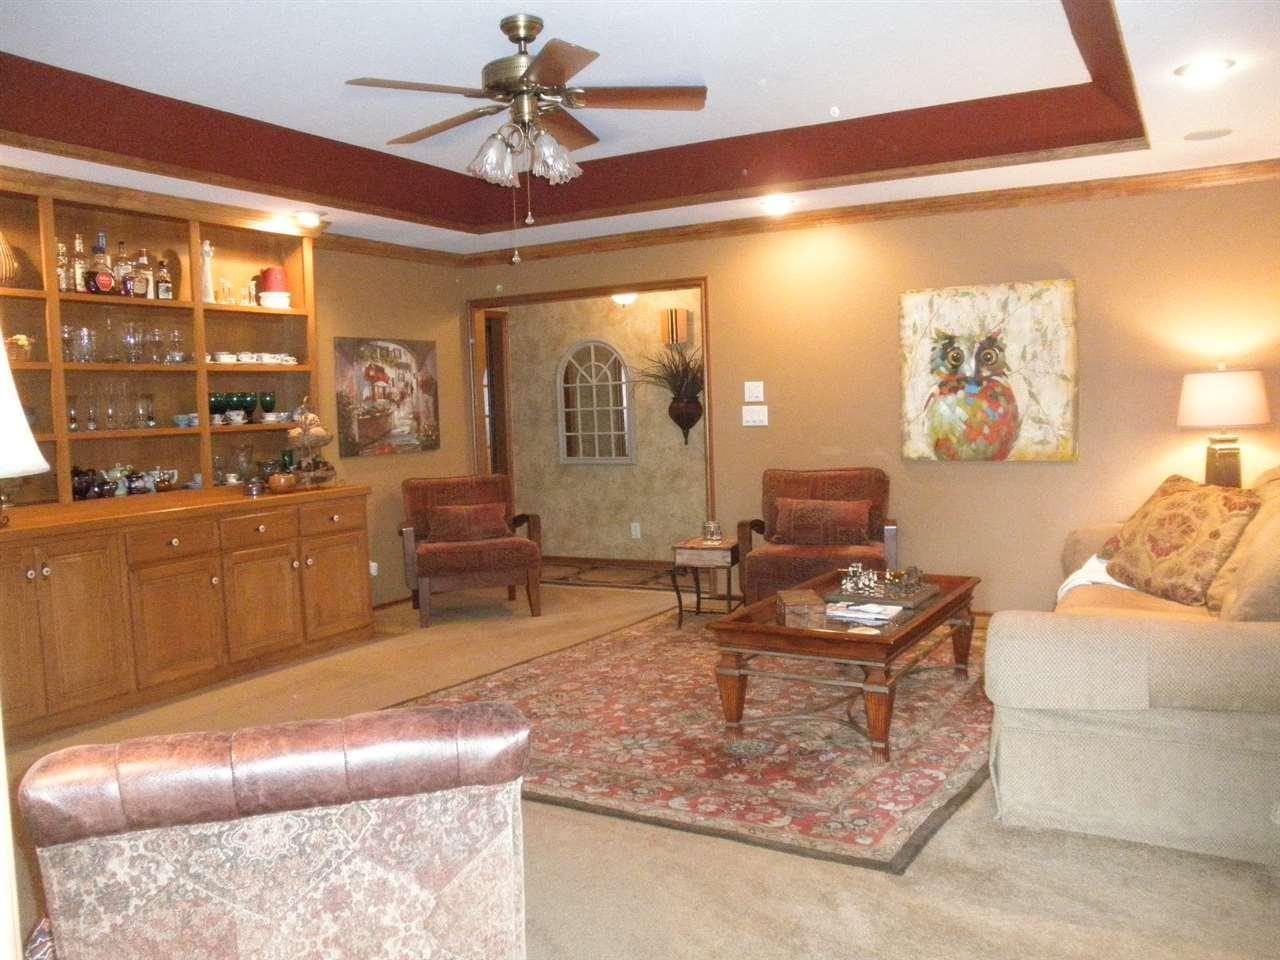 Sold Intraoffice W/MLS | 2800 Green Meadow Ponca City, OK 74604 3